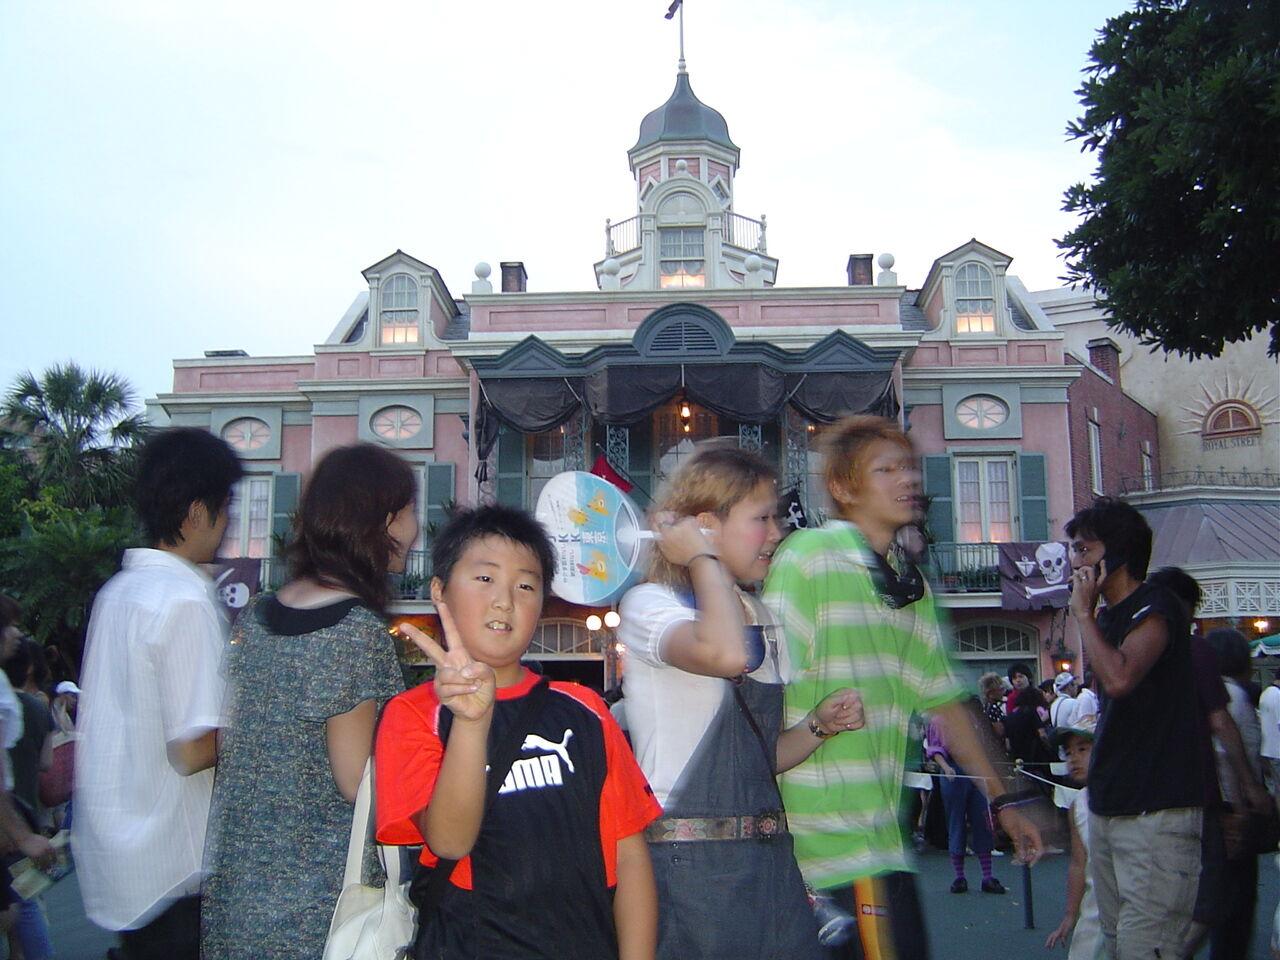 https://livedoor.blogimg.jp/ikouyou_1204/imgs/f/1/f165649b.jpg